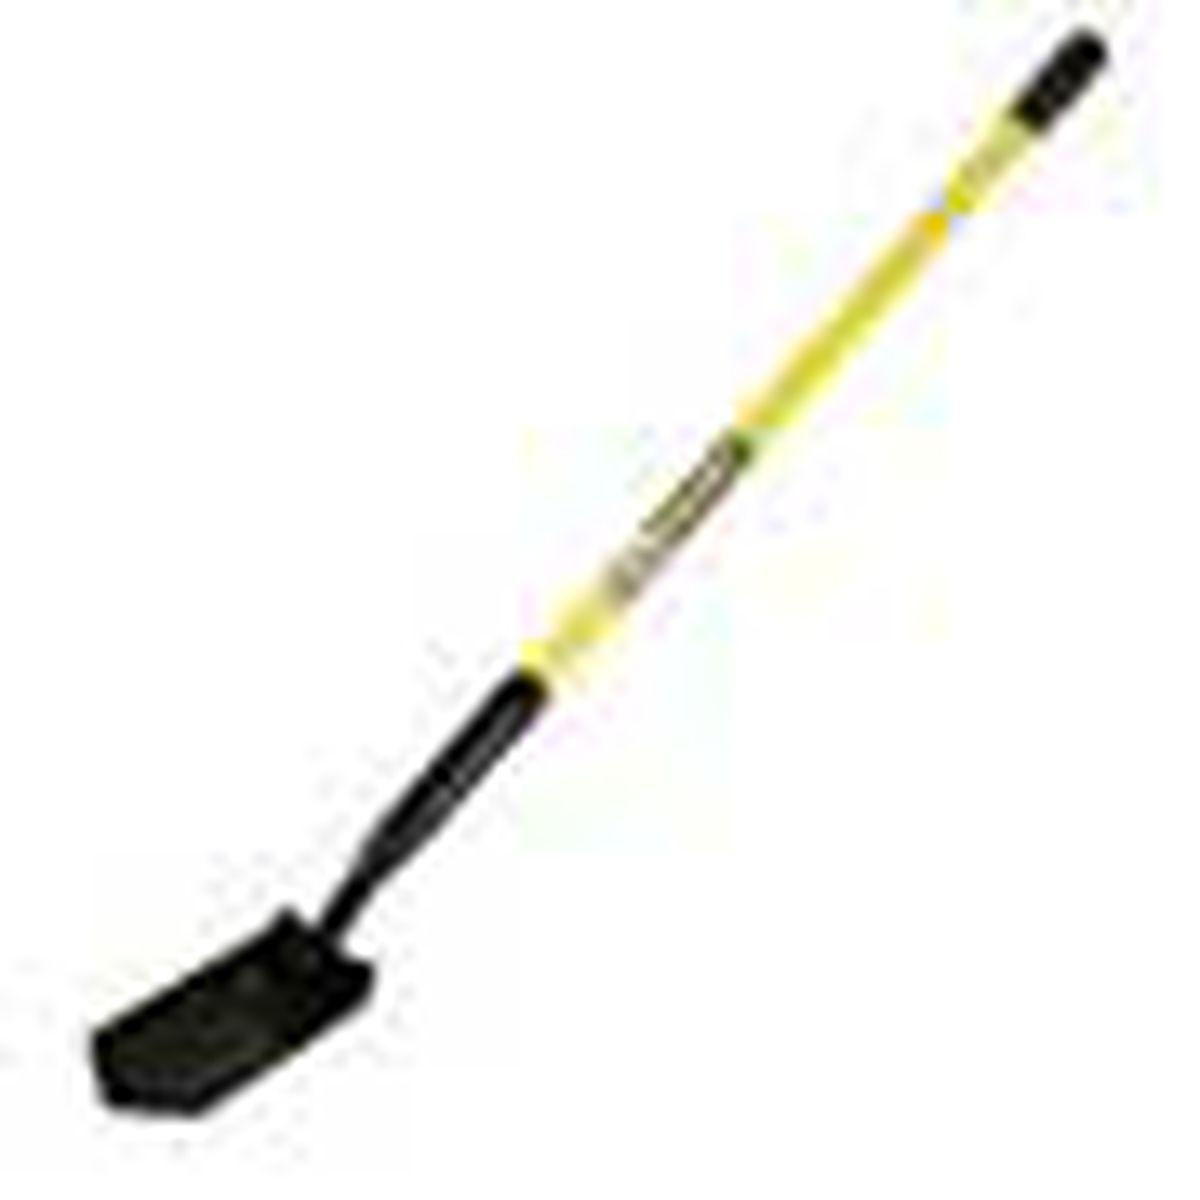 Trenching Shovel